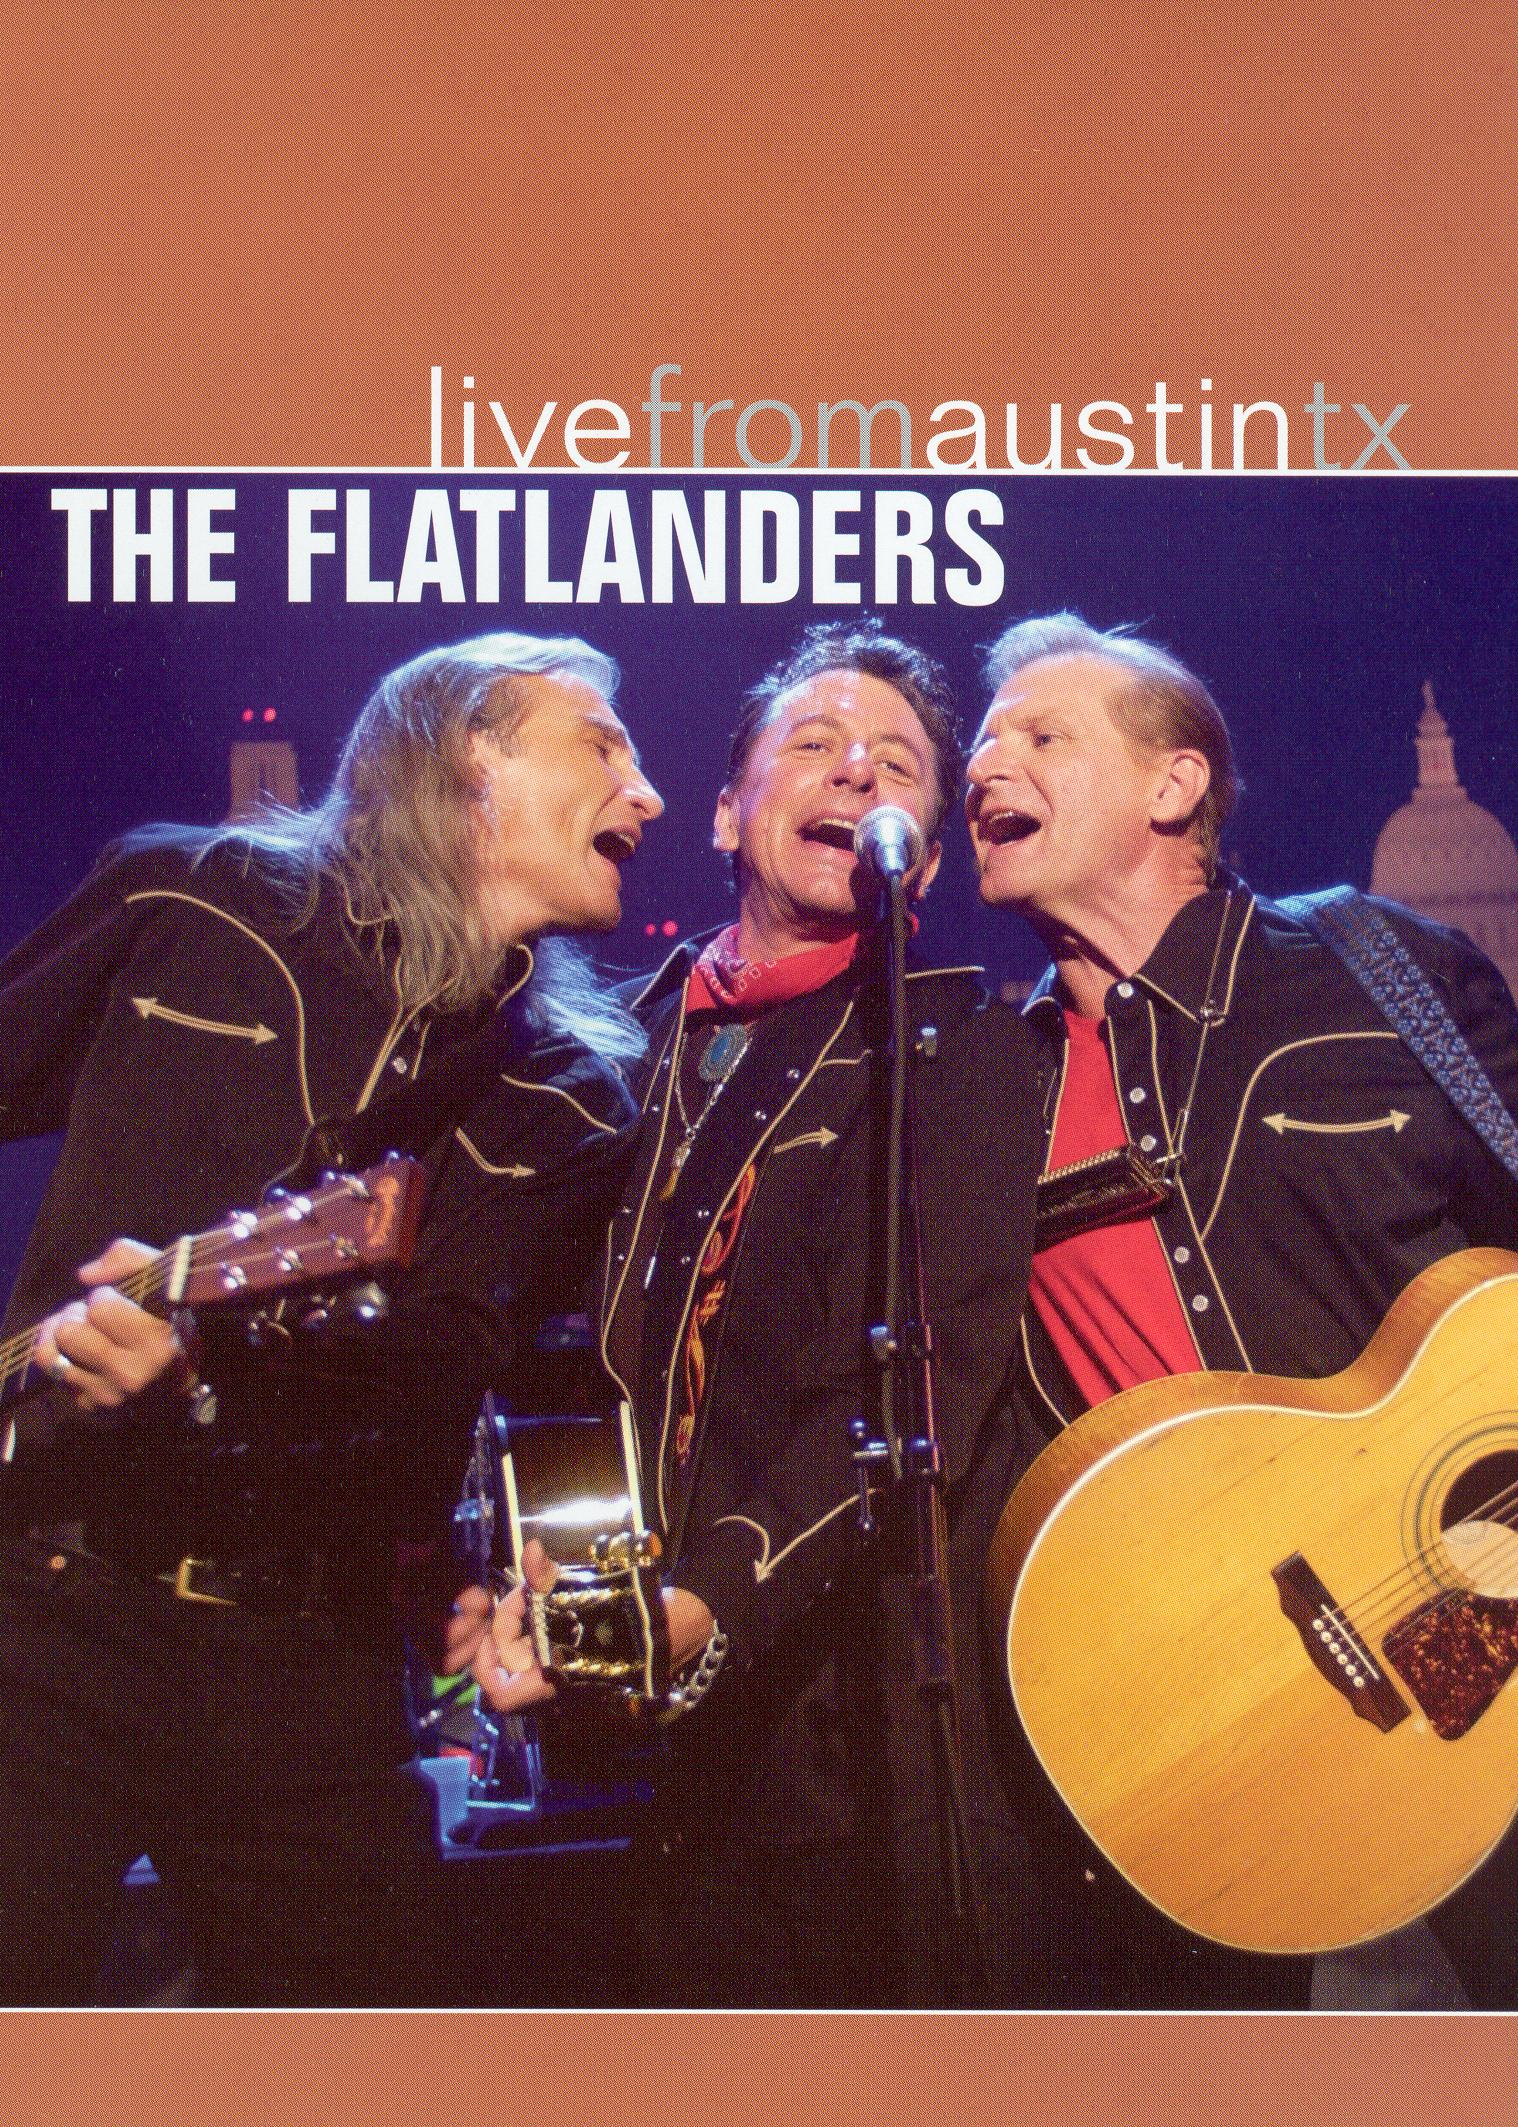 Live From Austin TX: The Flatlanders